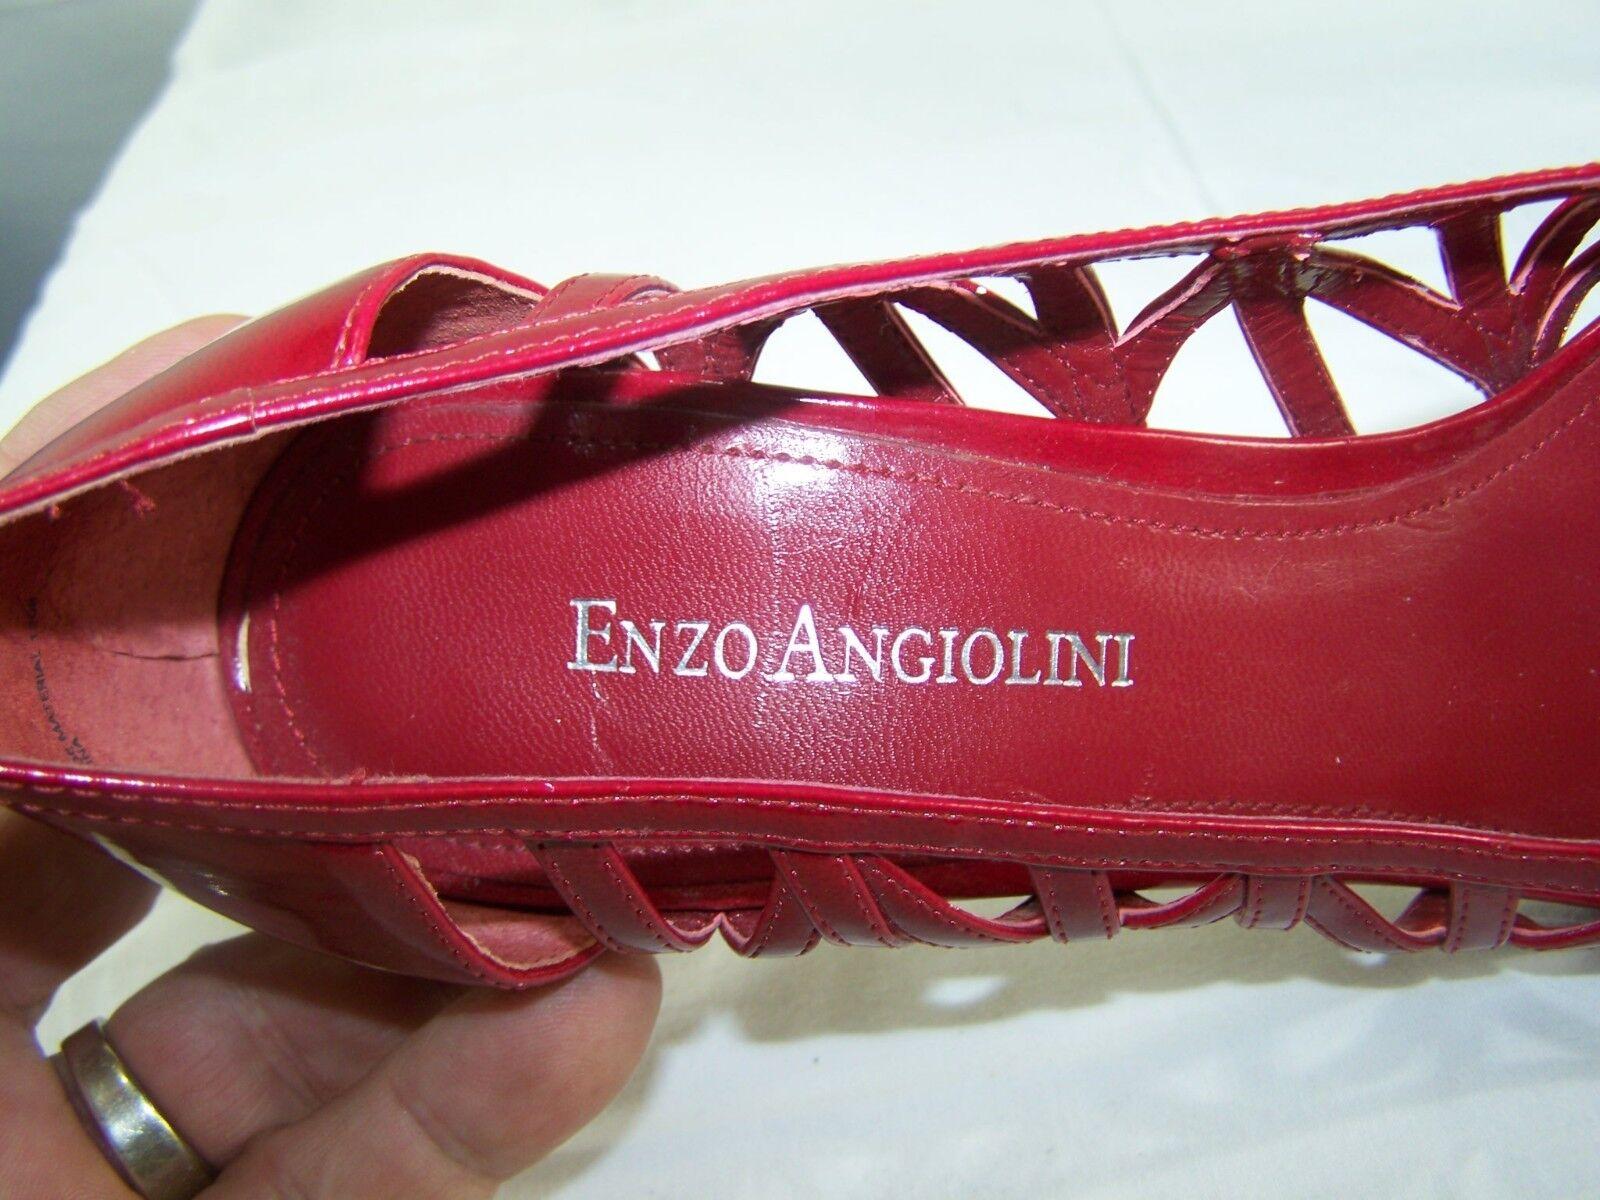 Enzo Aniolinig rot Eyelet Wet Look Open Toe Heels schuhe schuhe schuhe damen Größe 8M 8 M 03b49f